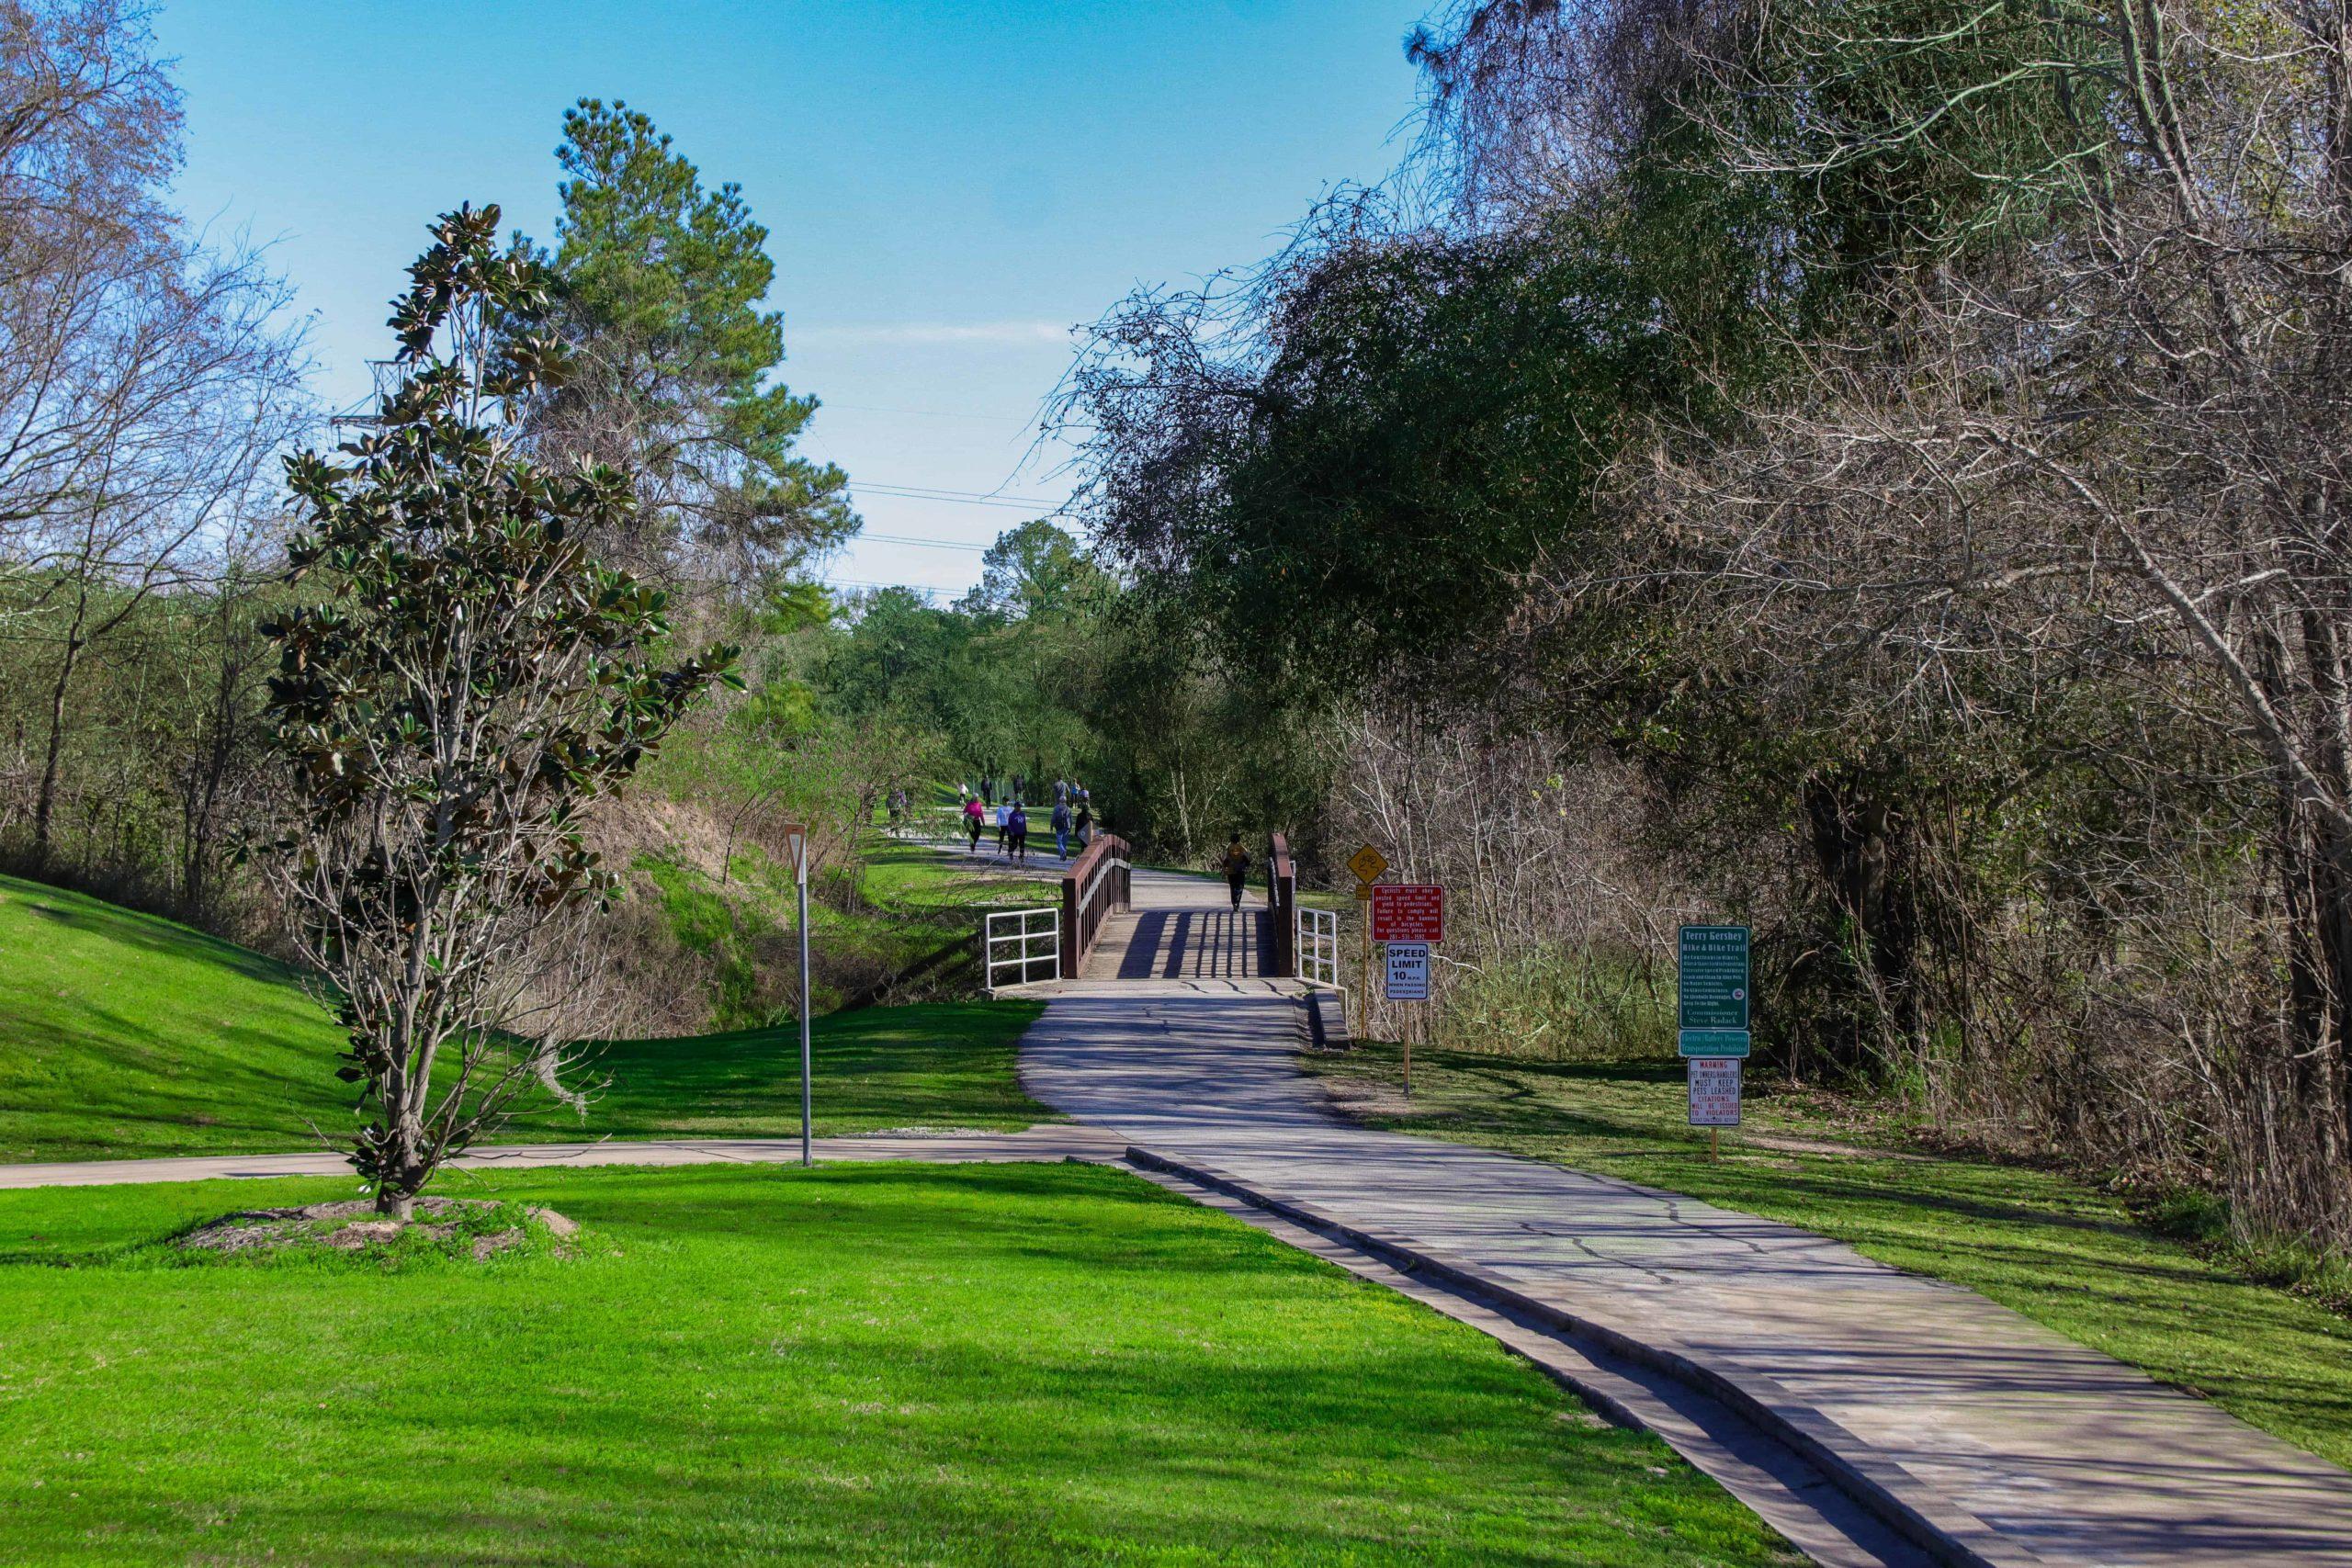 Terry Hershey Park - Energy Corridor Park